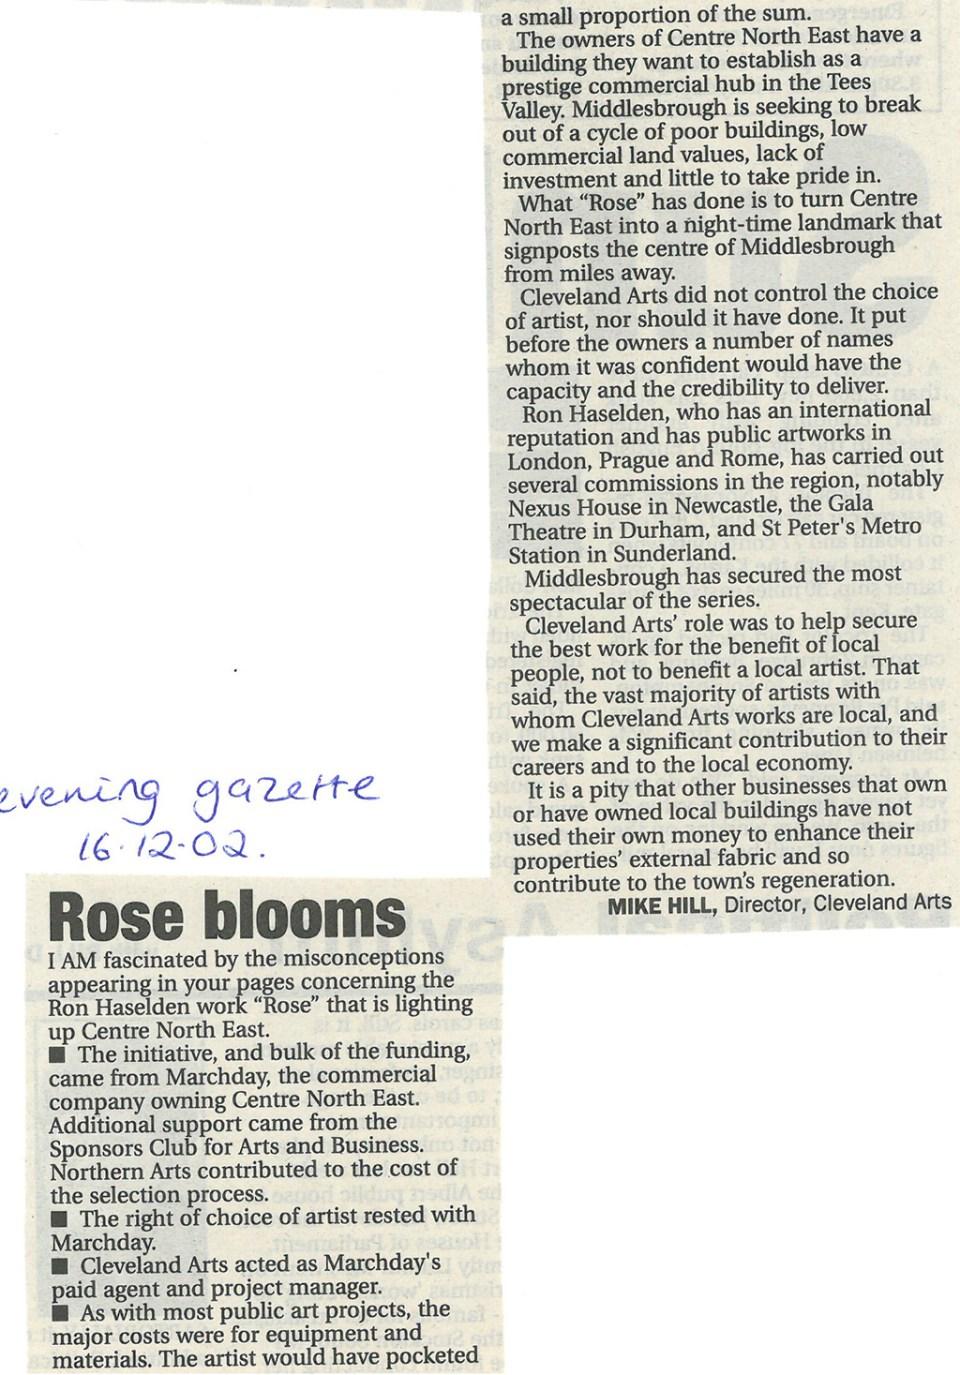 2002-12-16, Evening Gazette